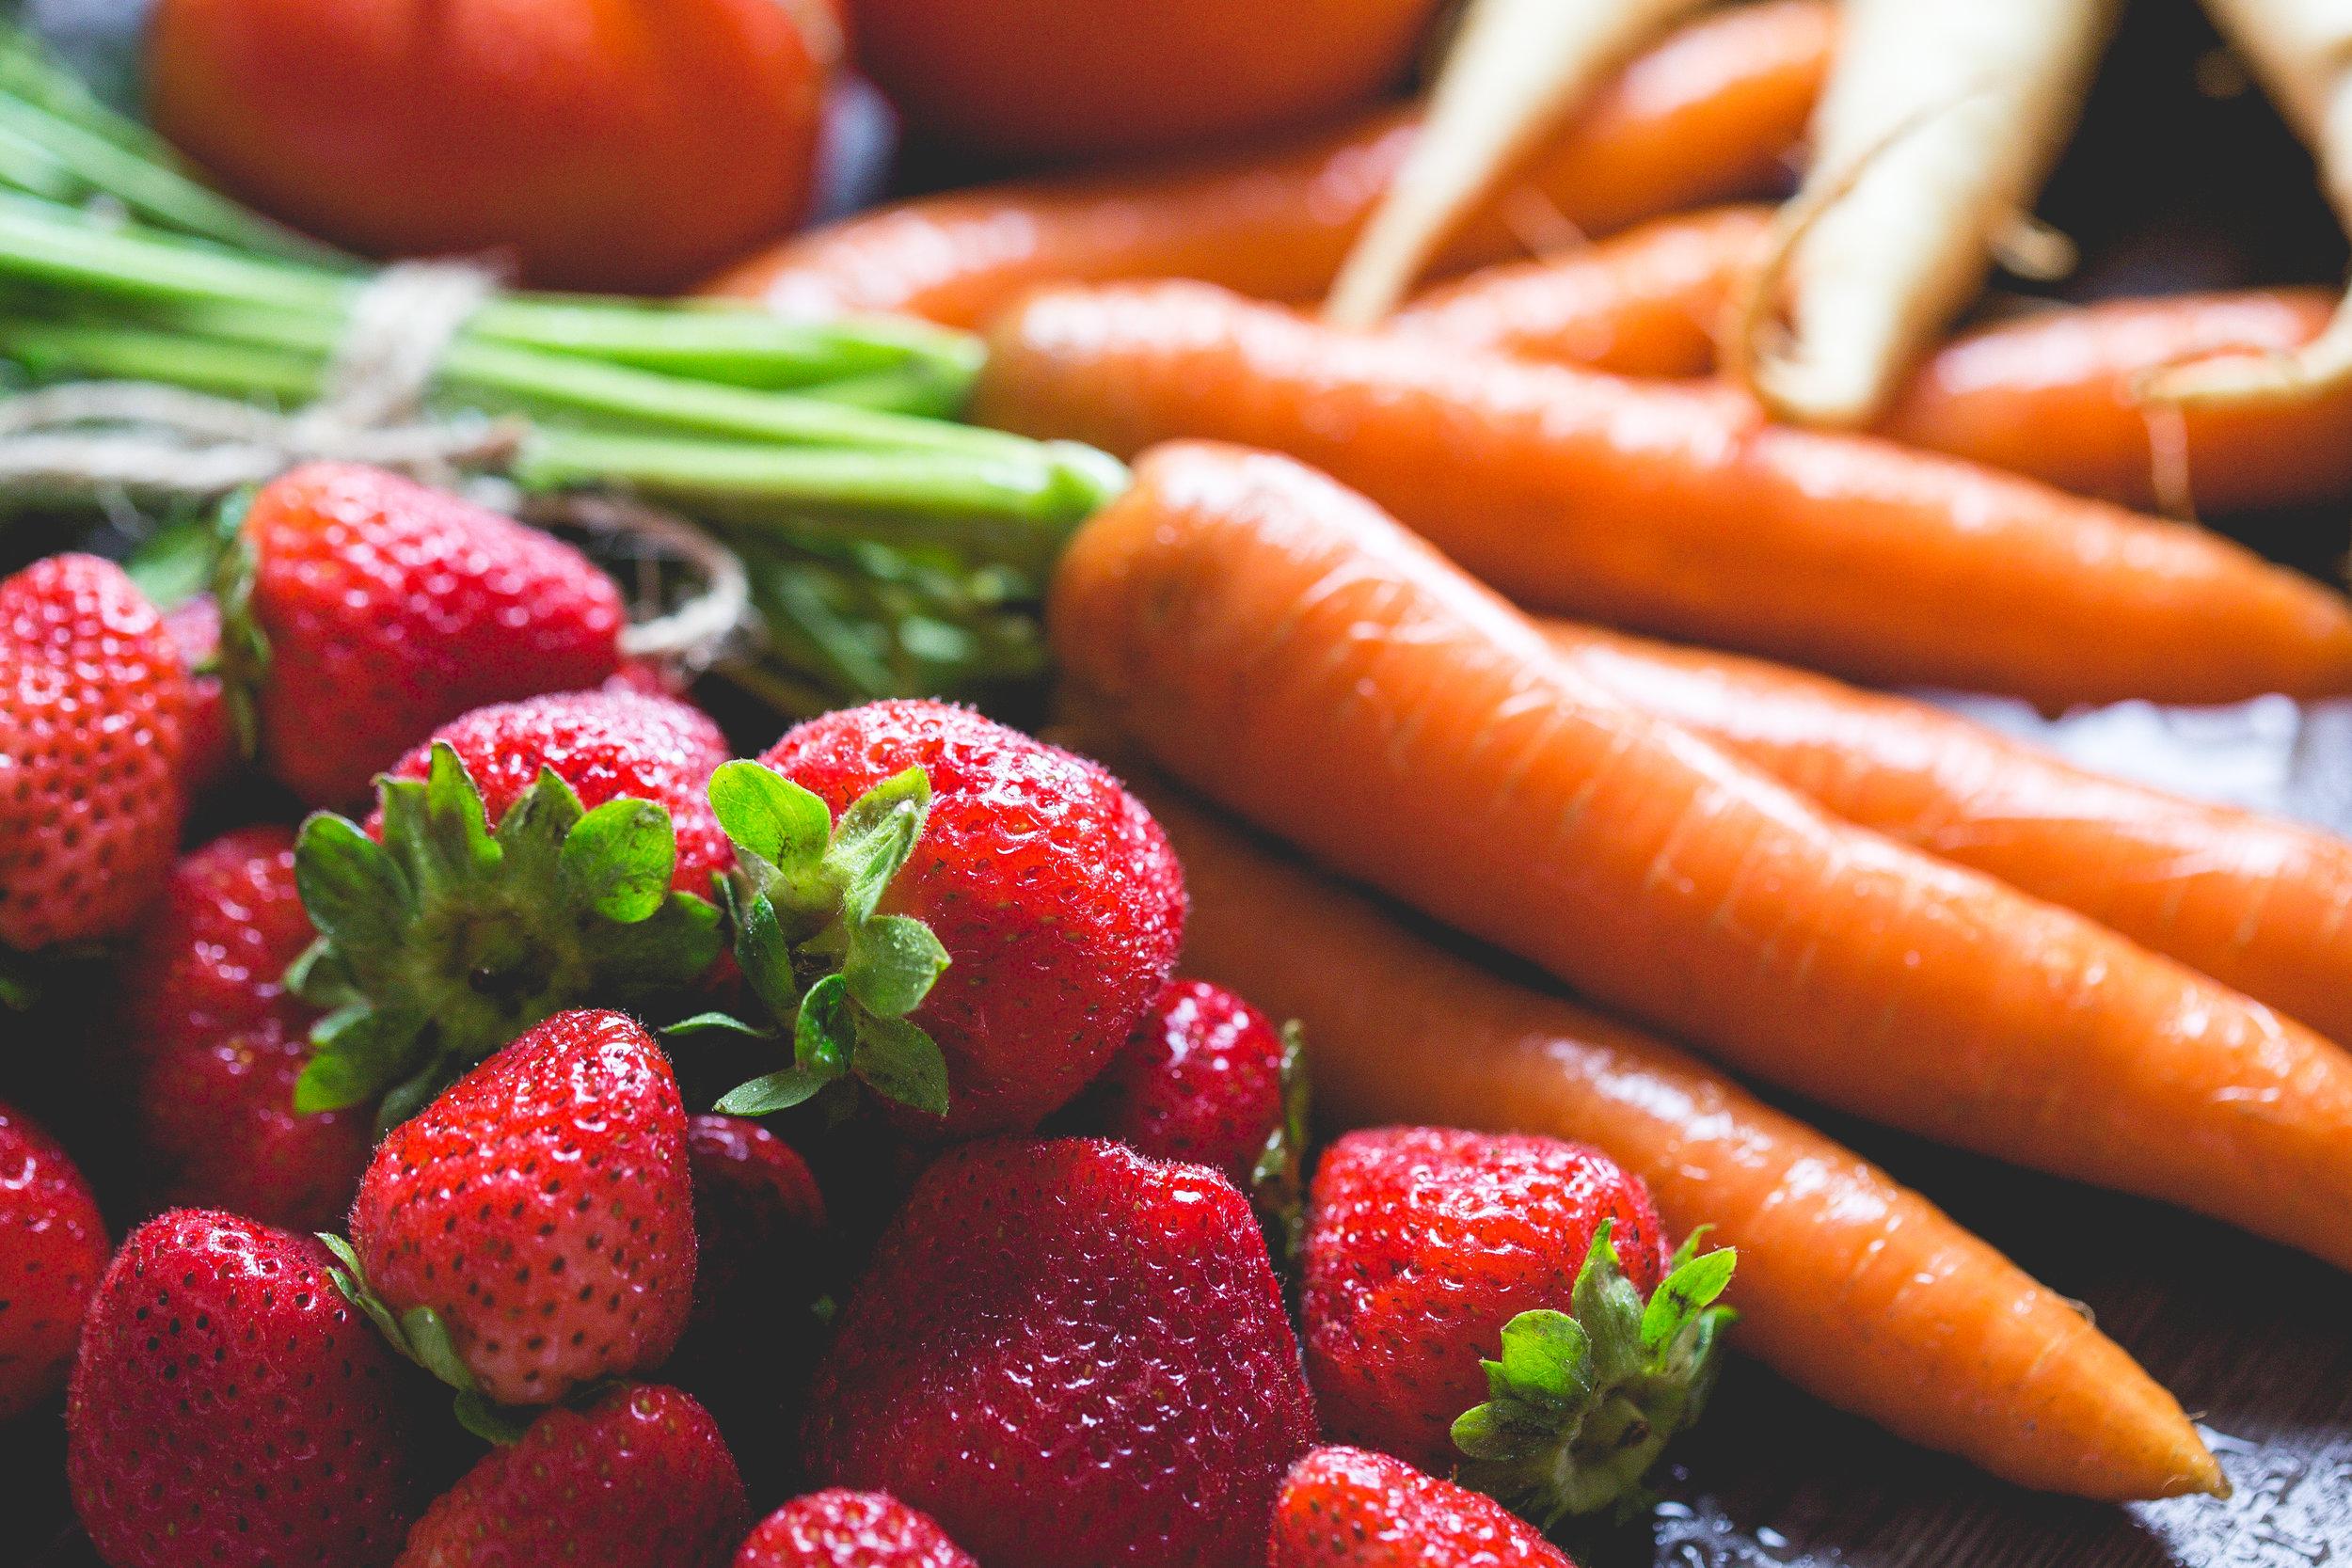 preparing-fresh-breakfast-strawberries-carrots-picjumbo-com.jpg